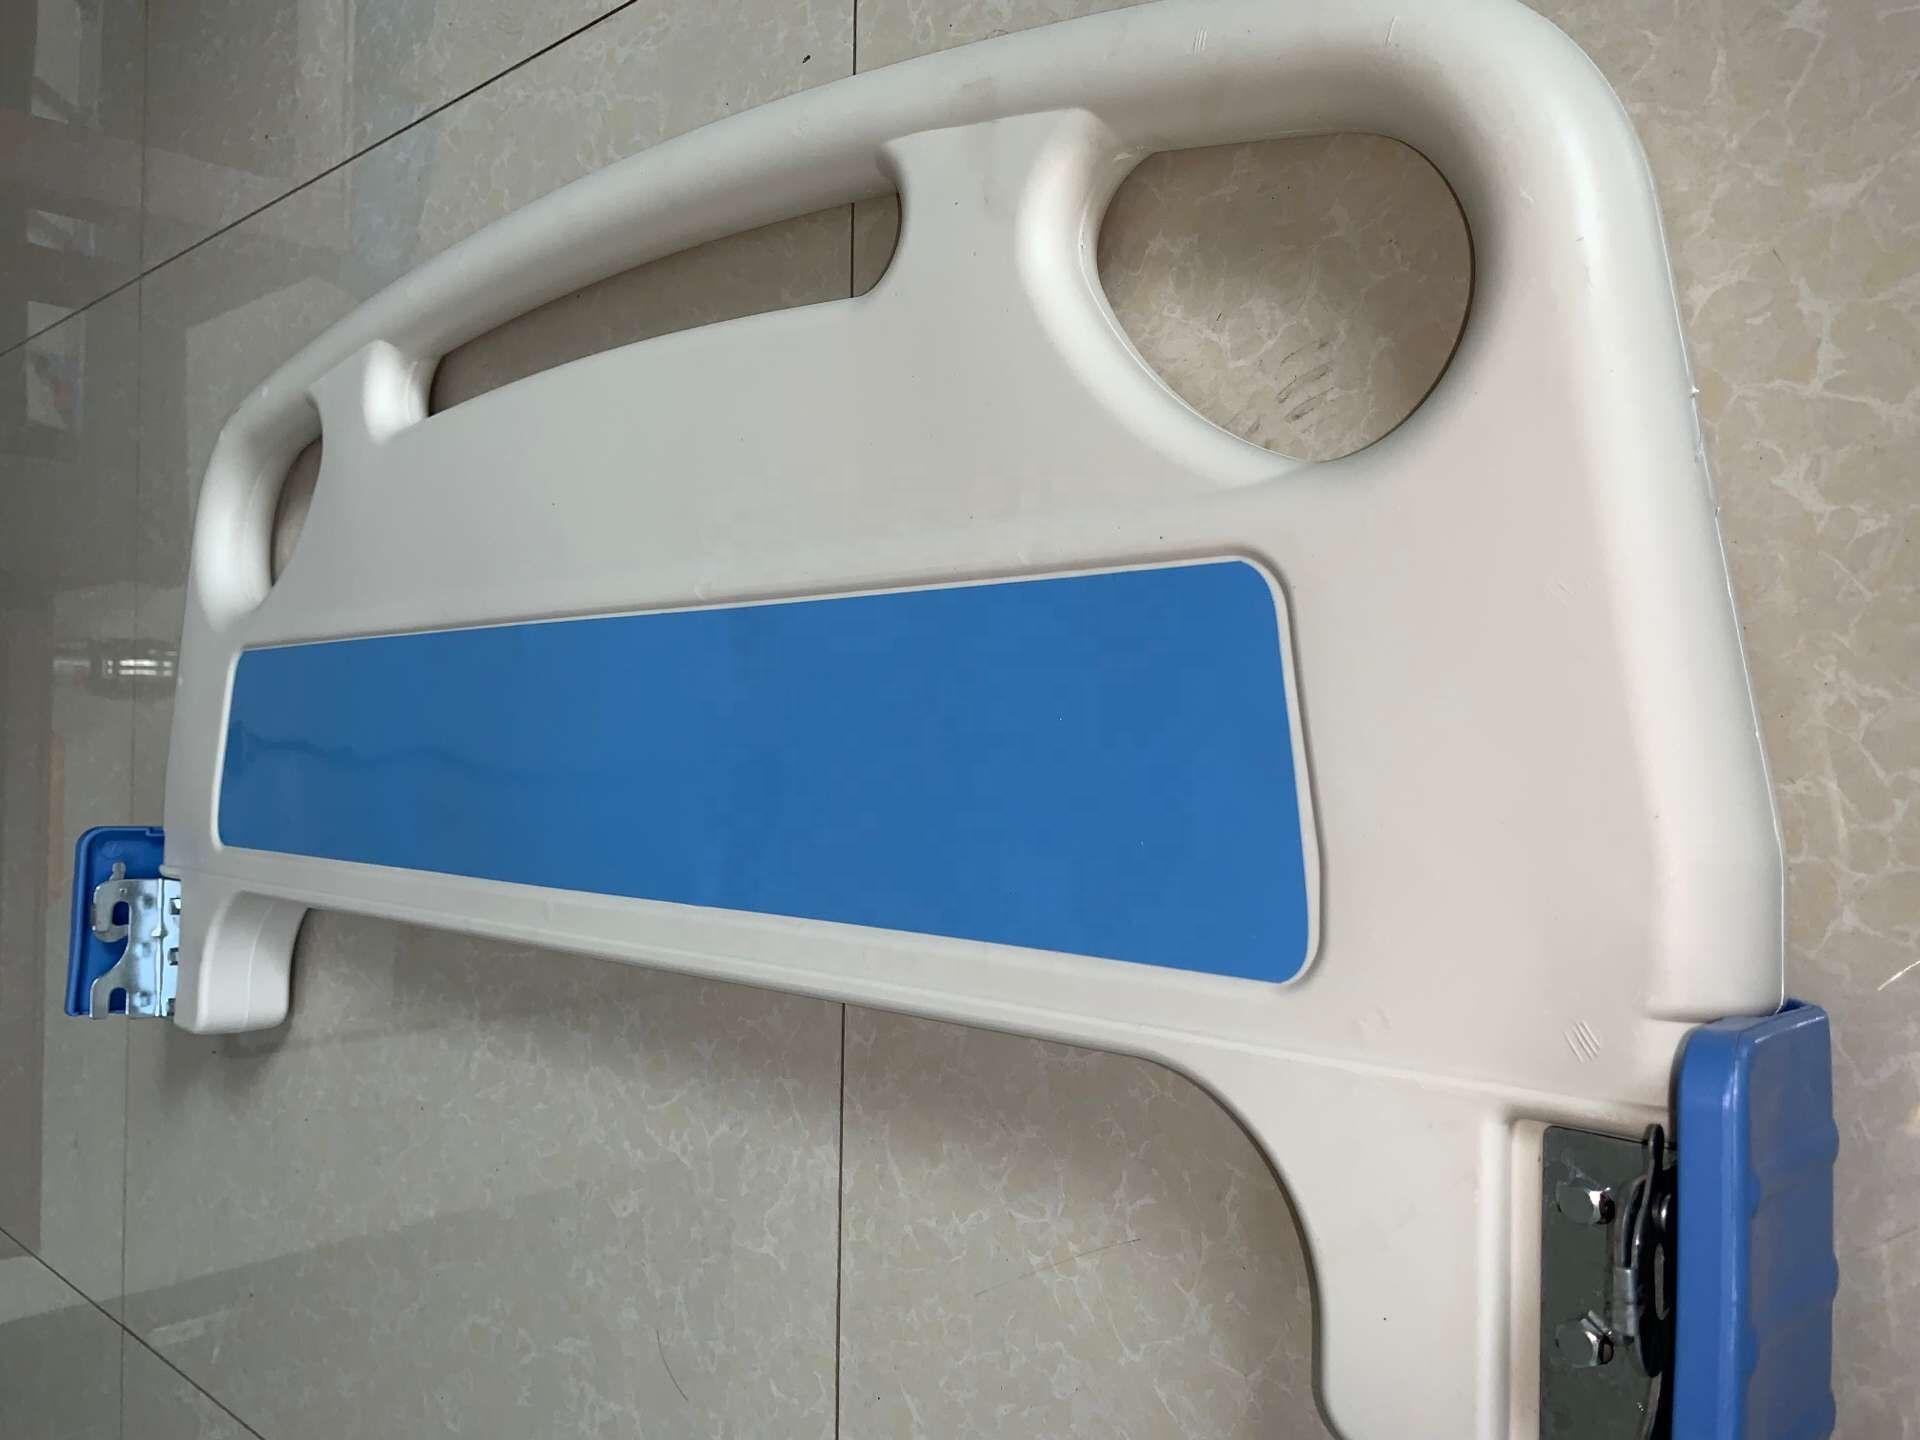 Cheap Medical ABS nursing Flat Plain ABS Bed Medical Bed Supplier Medical Hospital Bed